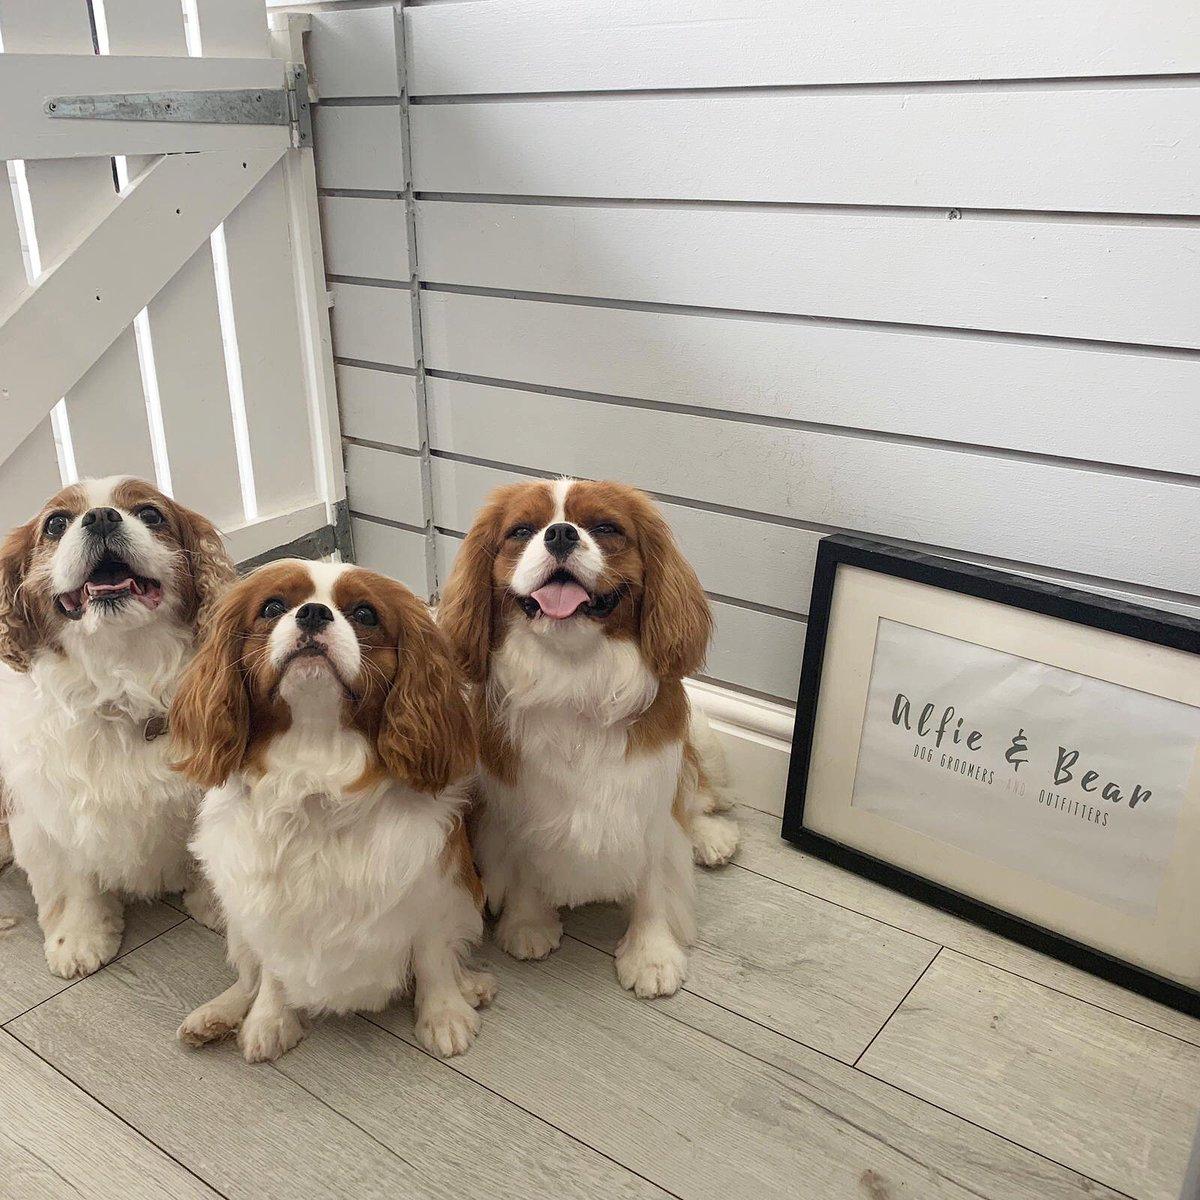 RT @AlfAndBear:  Gorgeous Little Cav Family  Dennis, Peggy & Penelope  #DogGroomer #DogGrooming #DogOfTheDay #CavalierKingCharlesSpaniel #Dogs #Puppy #DogSpa #DogGroomingSalon #DogsOfTwitter #DogLovers #NEFollowers #NewcastleUponTyne<br>http://pic.twitter.com/3ijXSyW34c